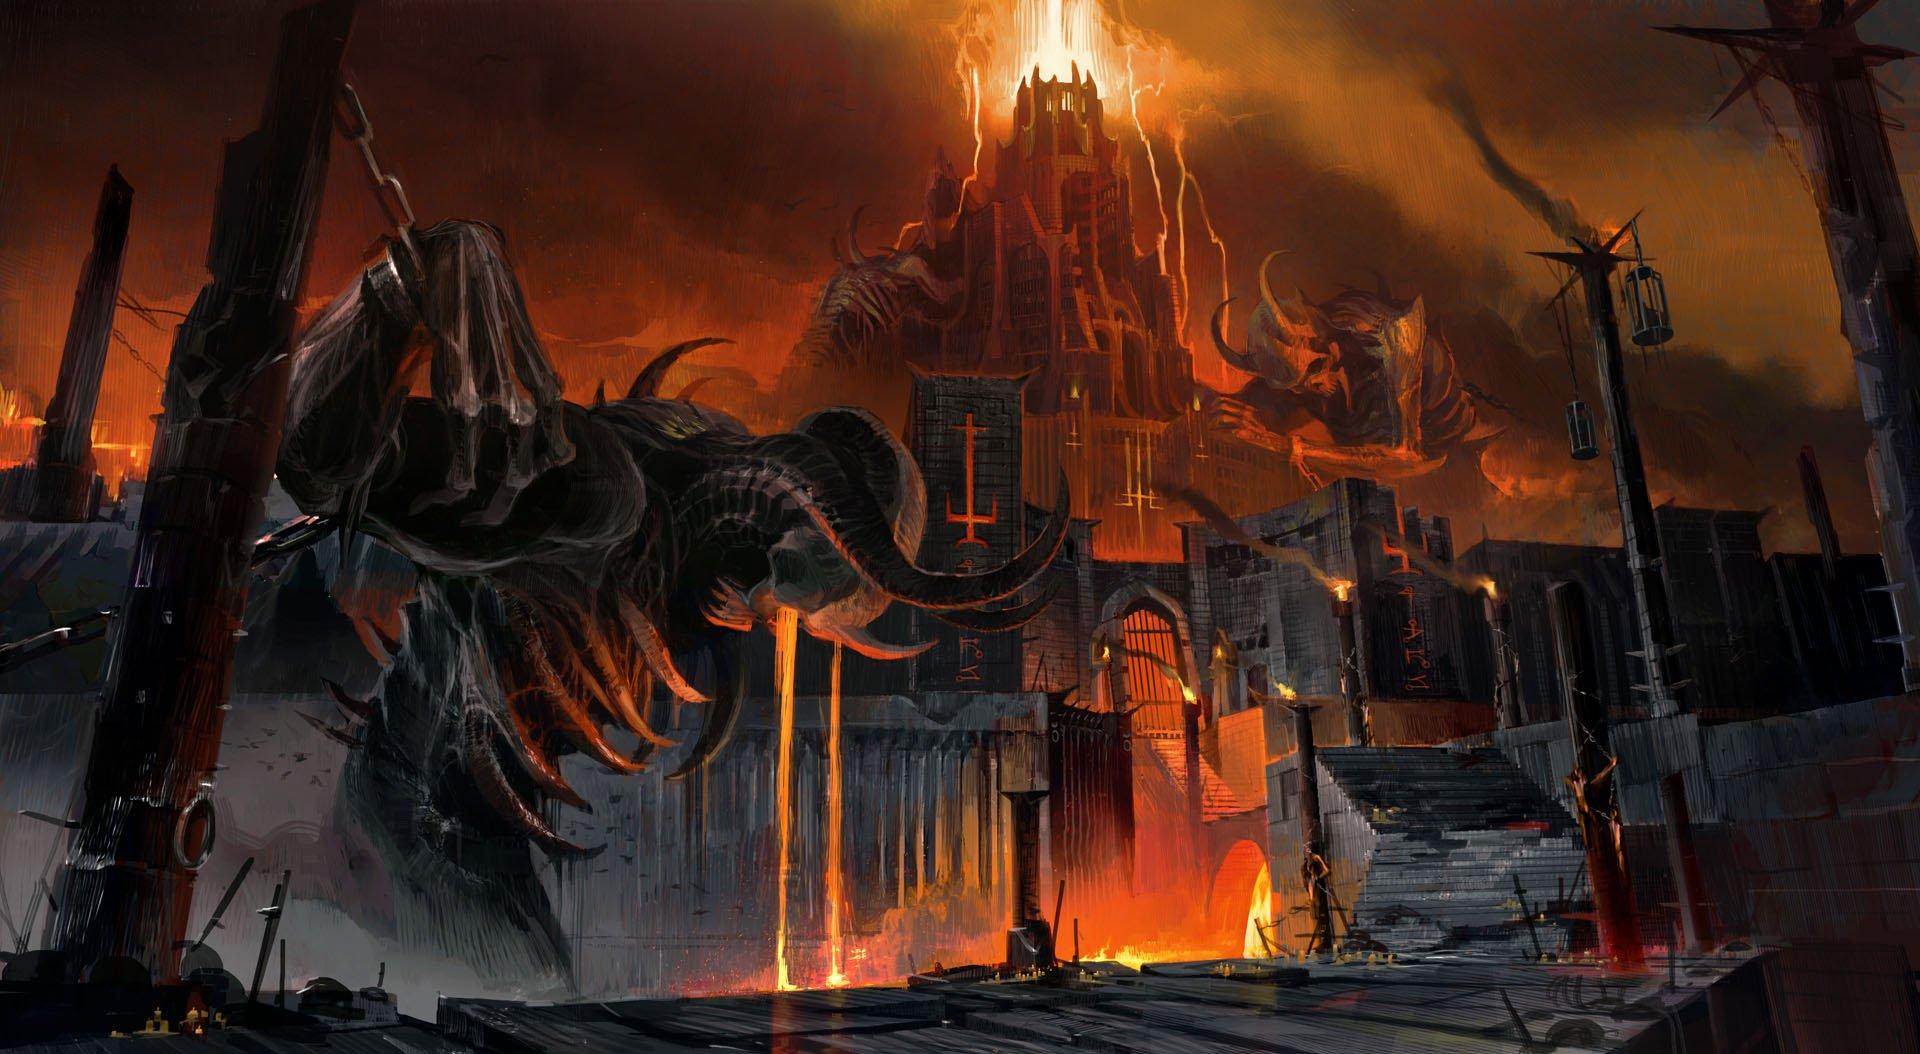 mira-el-primer-gameplay1-y-detalles-de-doom-eternal-frikgiamers.com